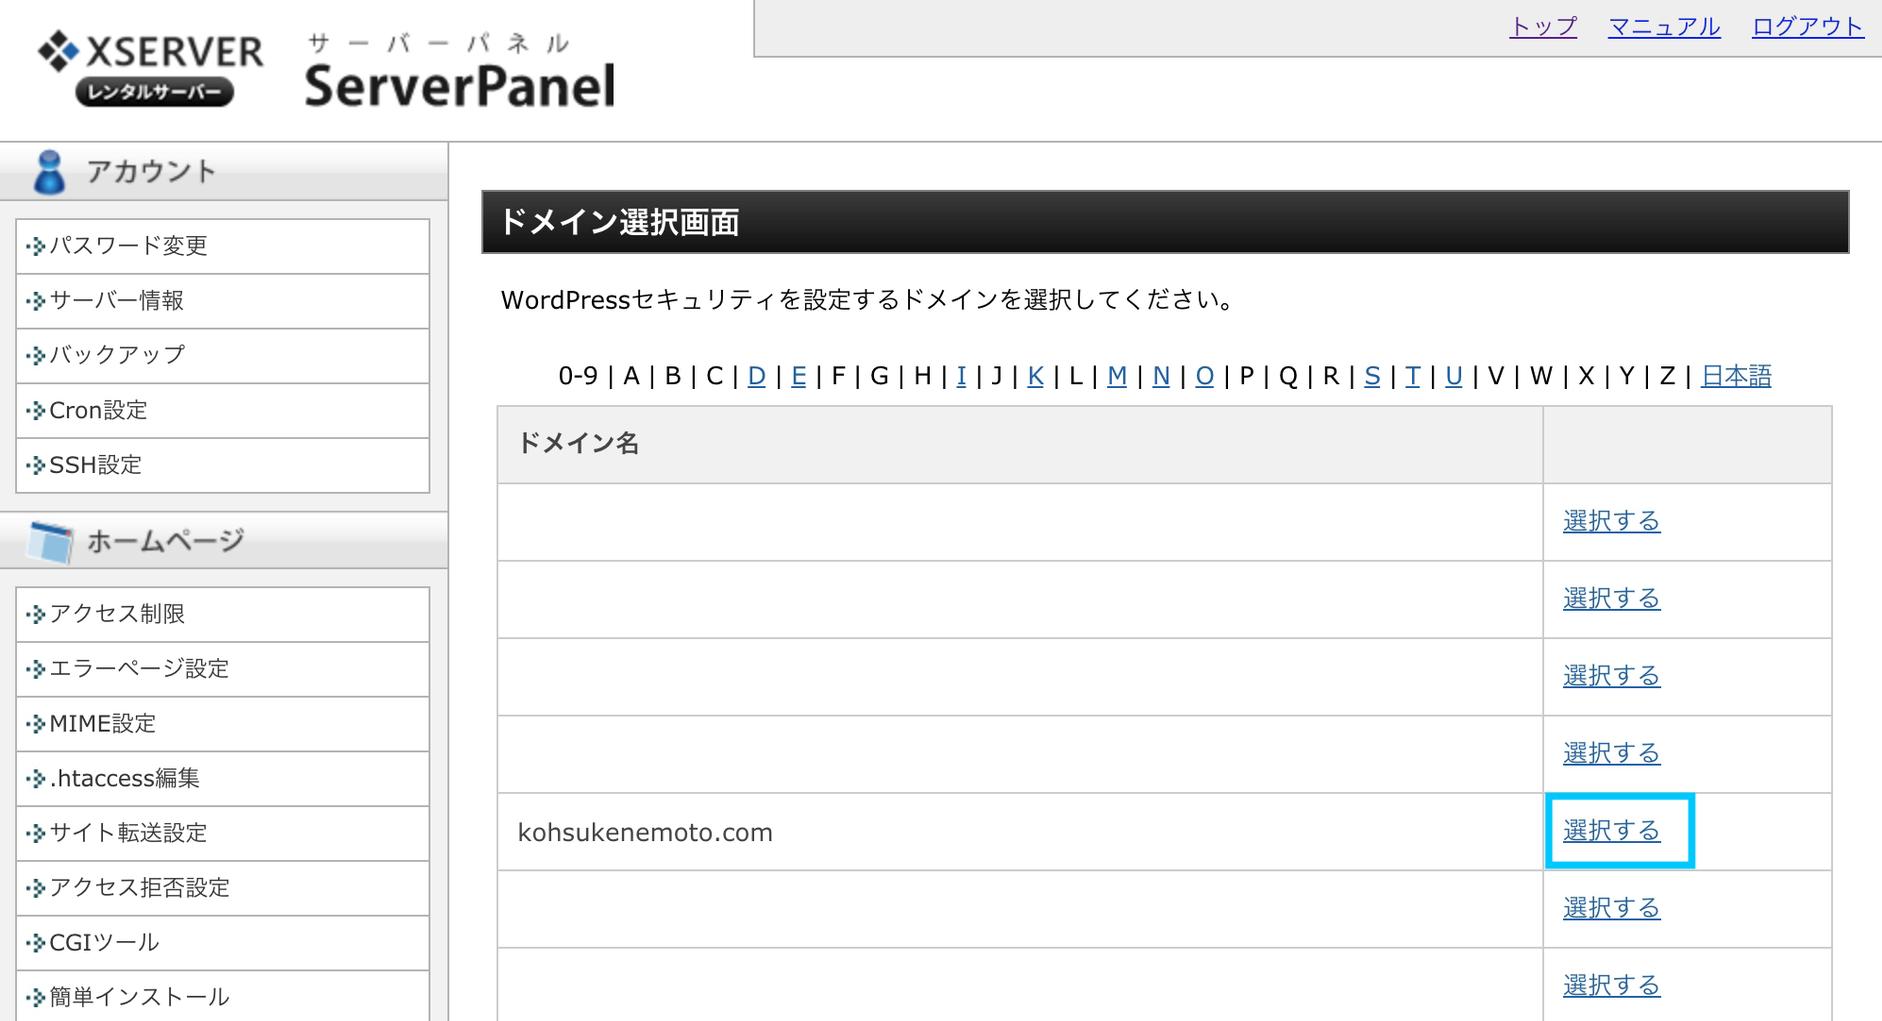 Xserverでドメインを選択する